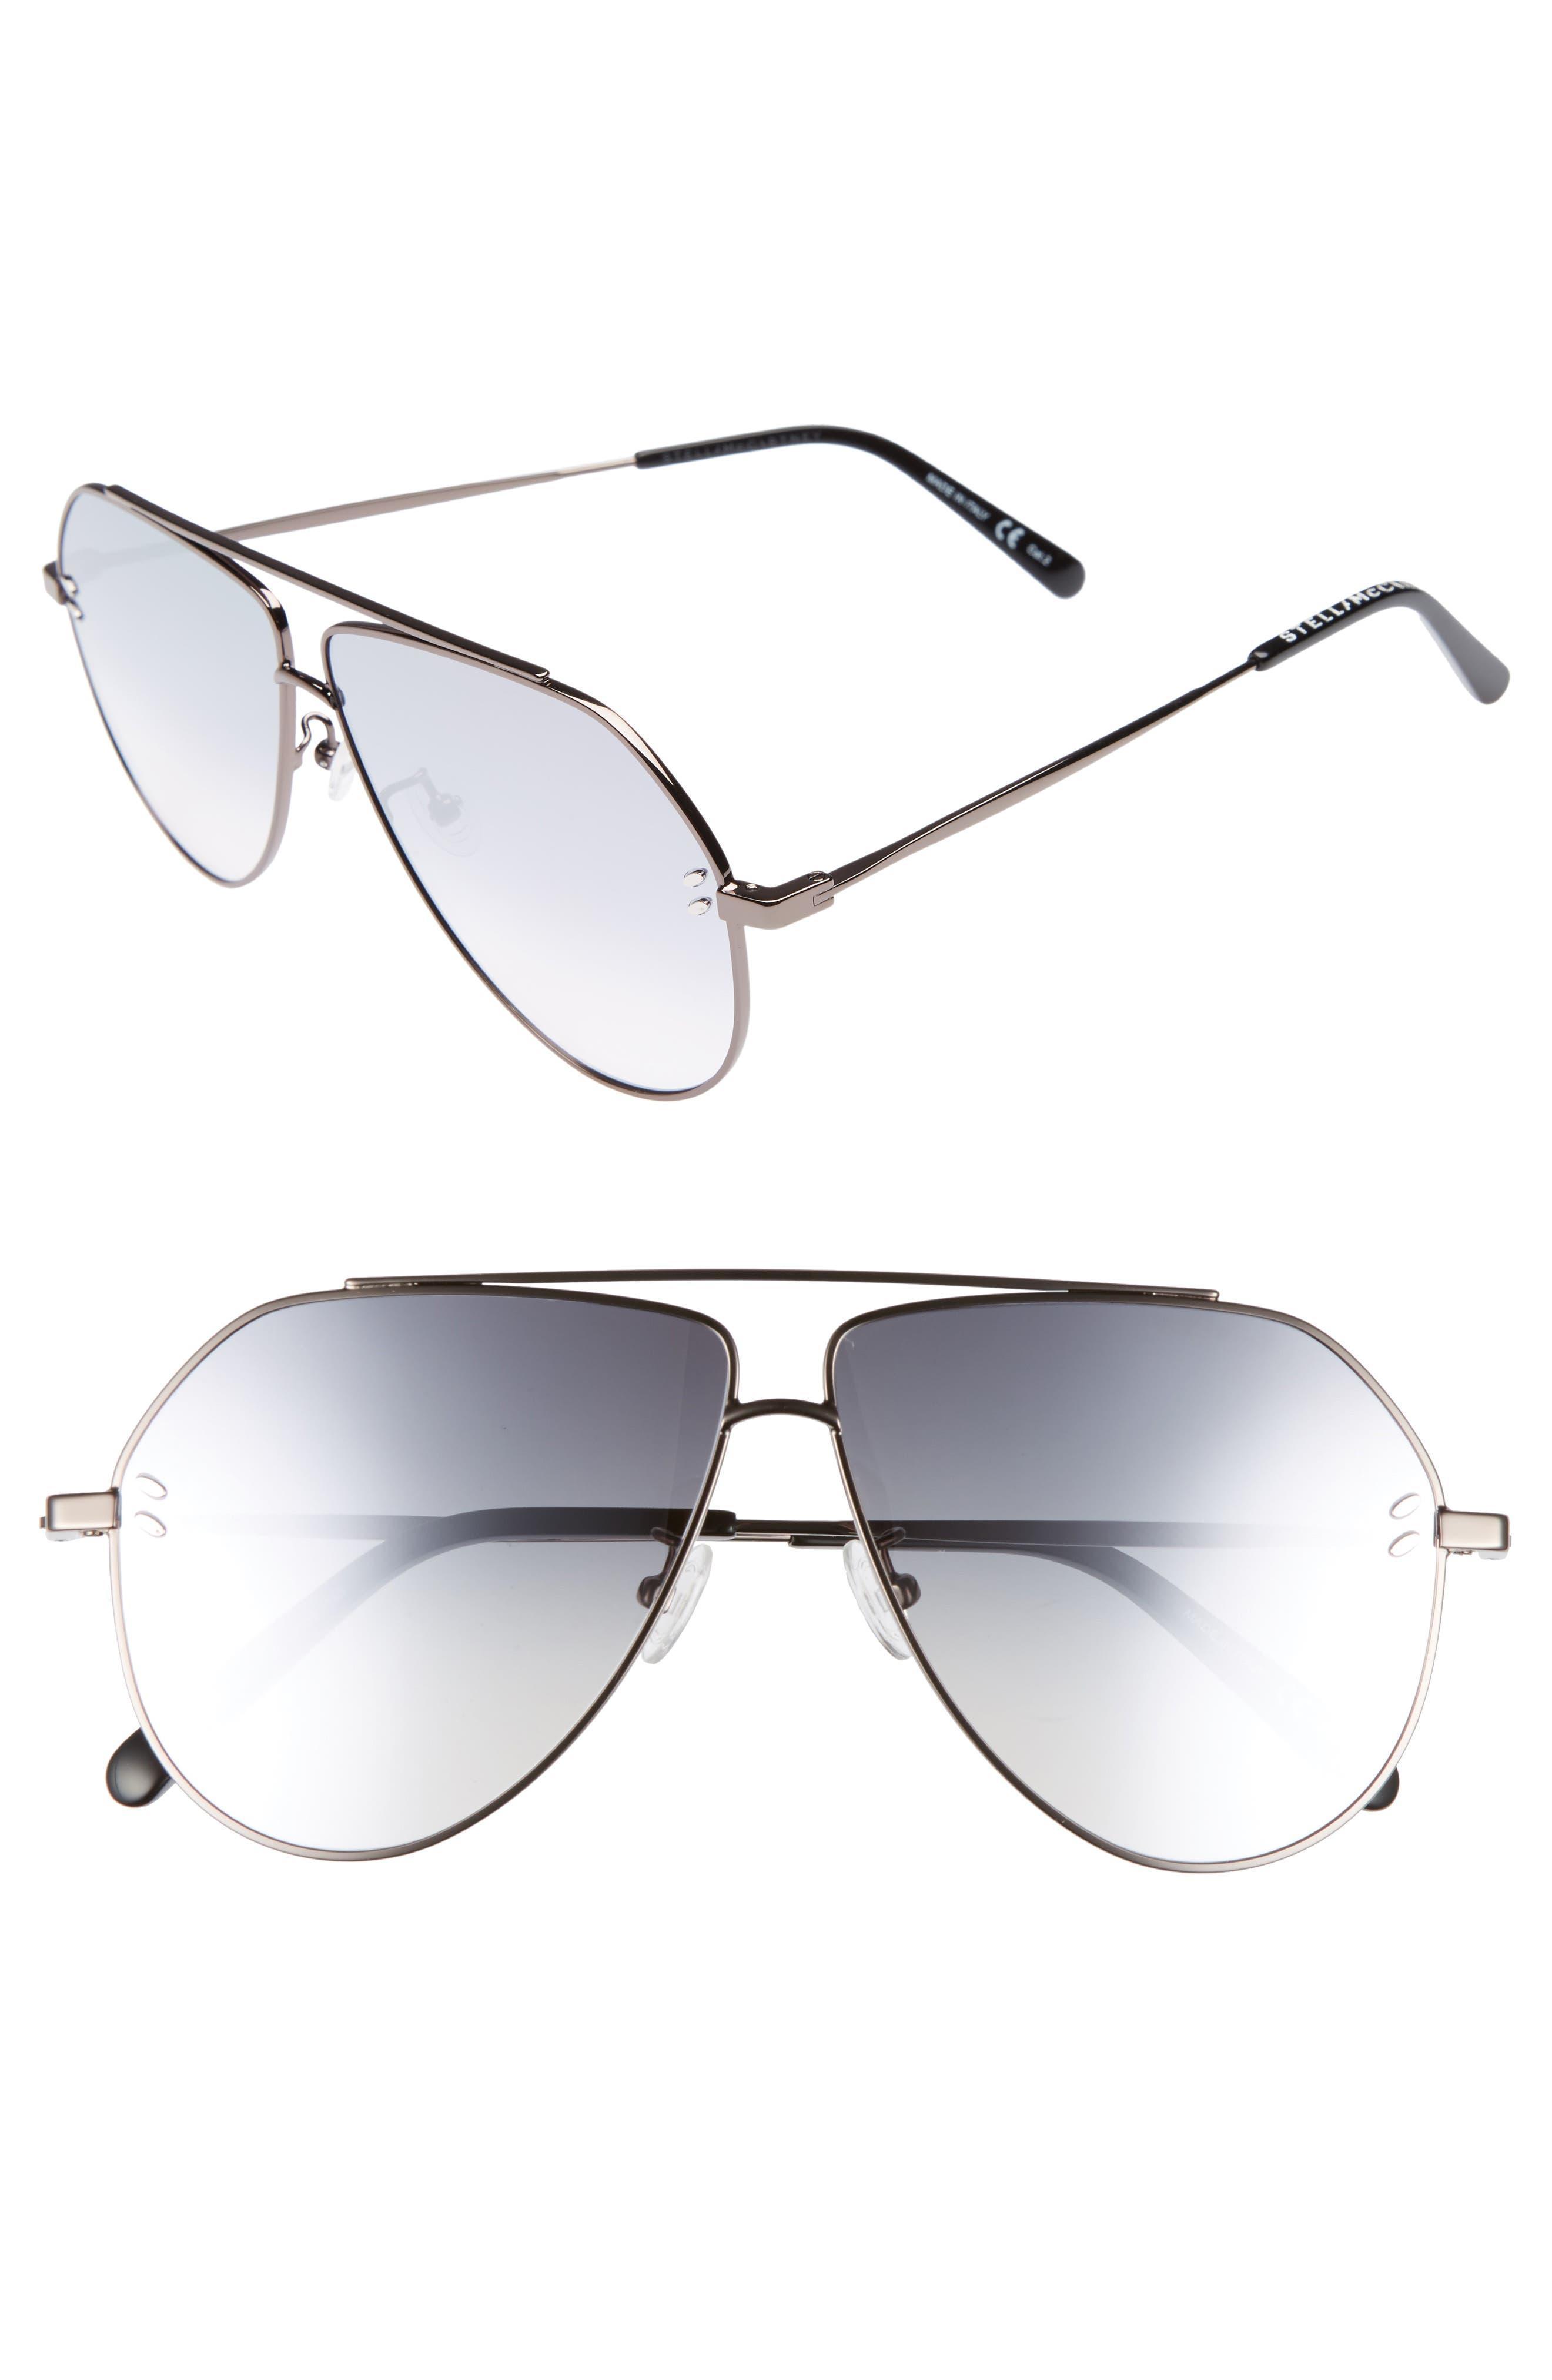 60mm Aviator Sunglasses,                             Main thumbnail 1, color,                             040